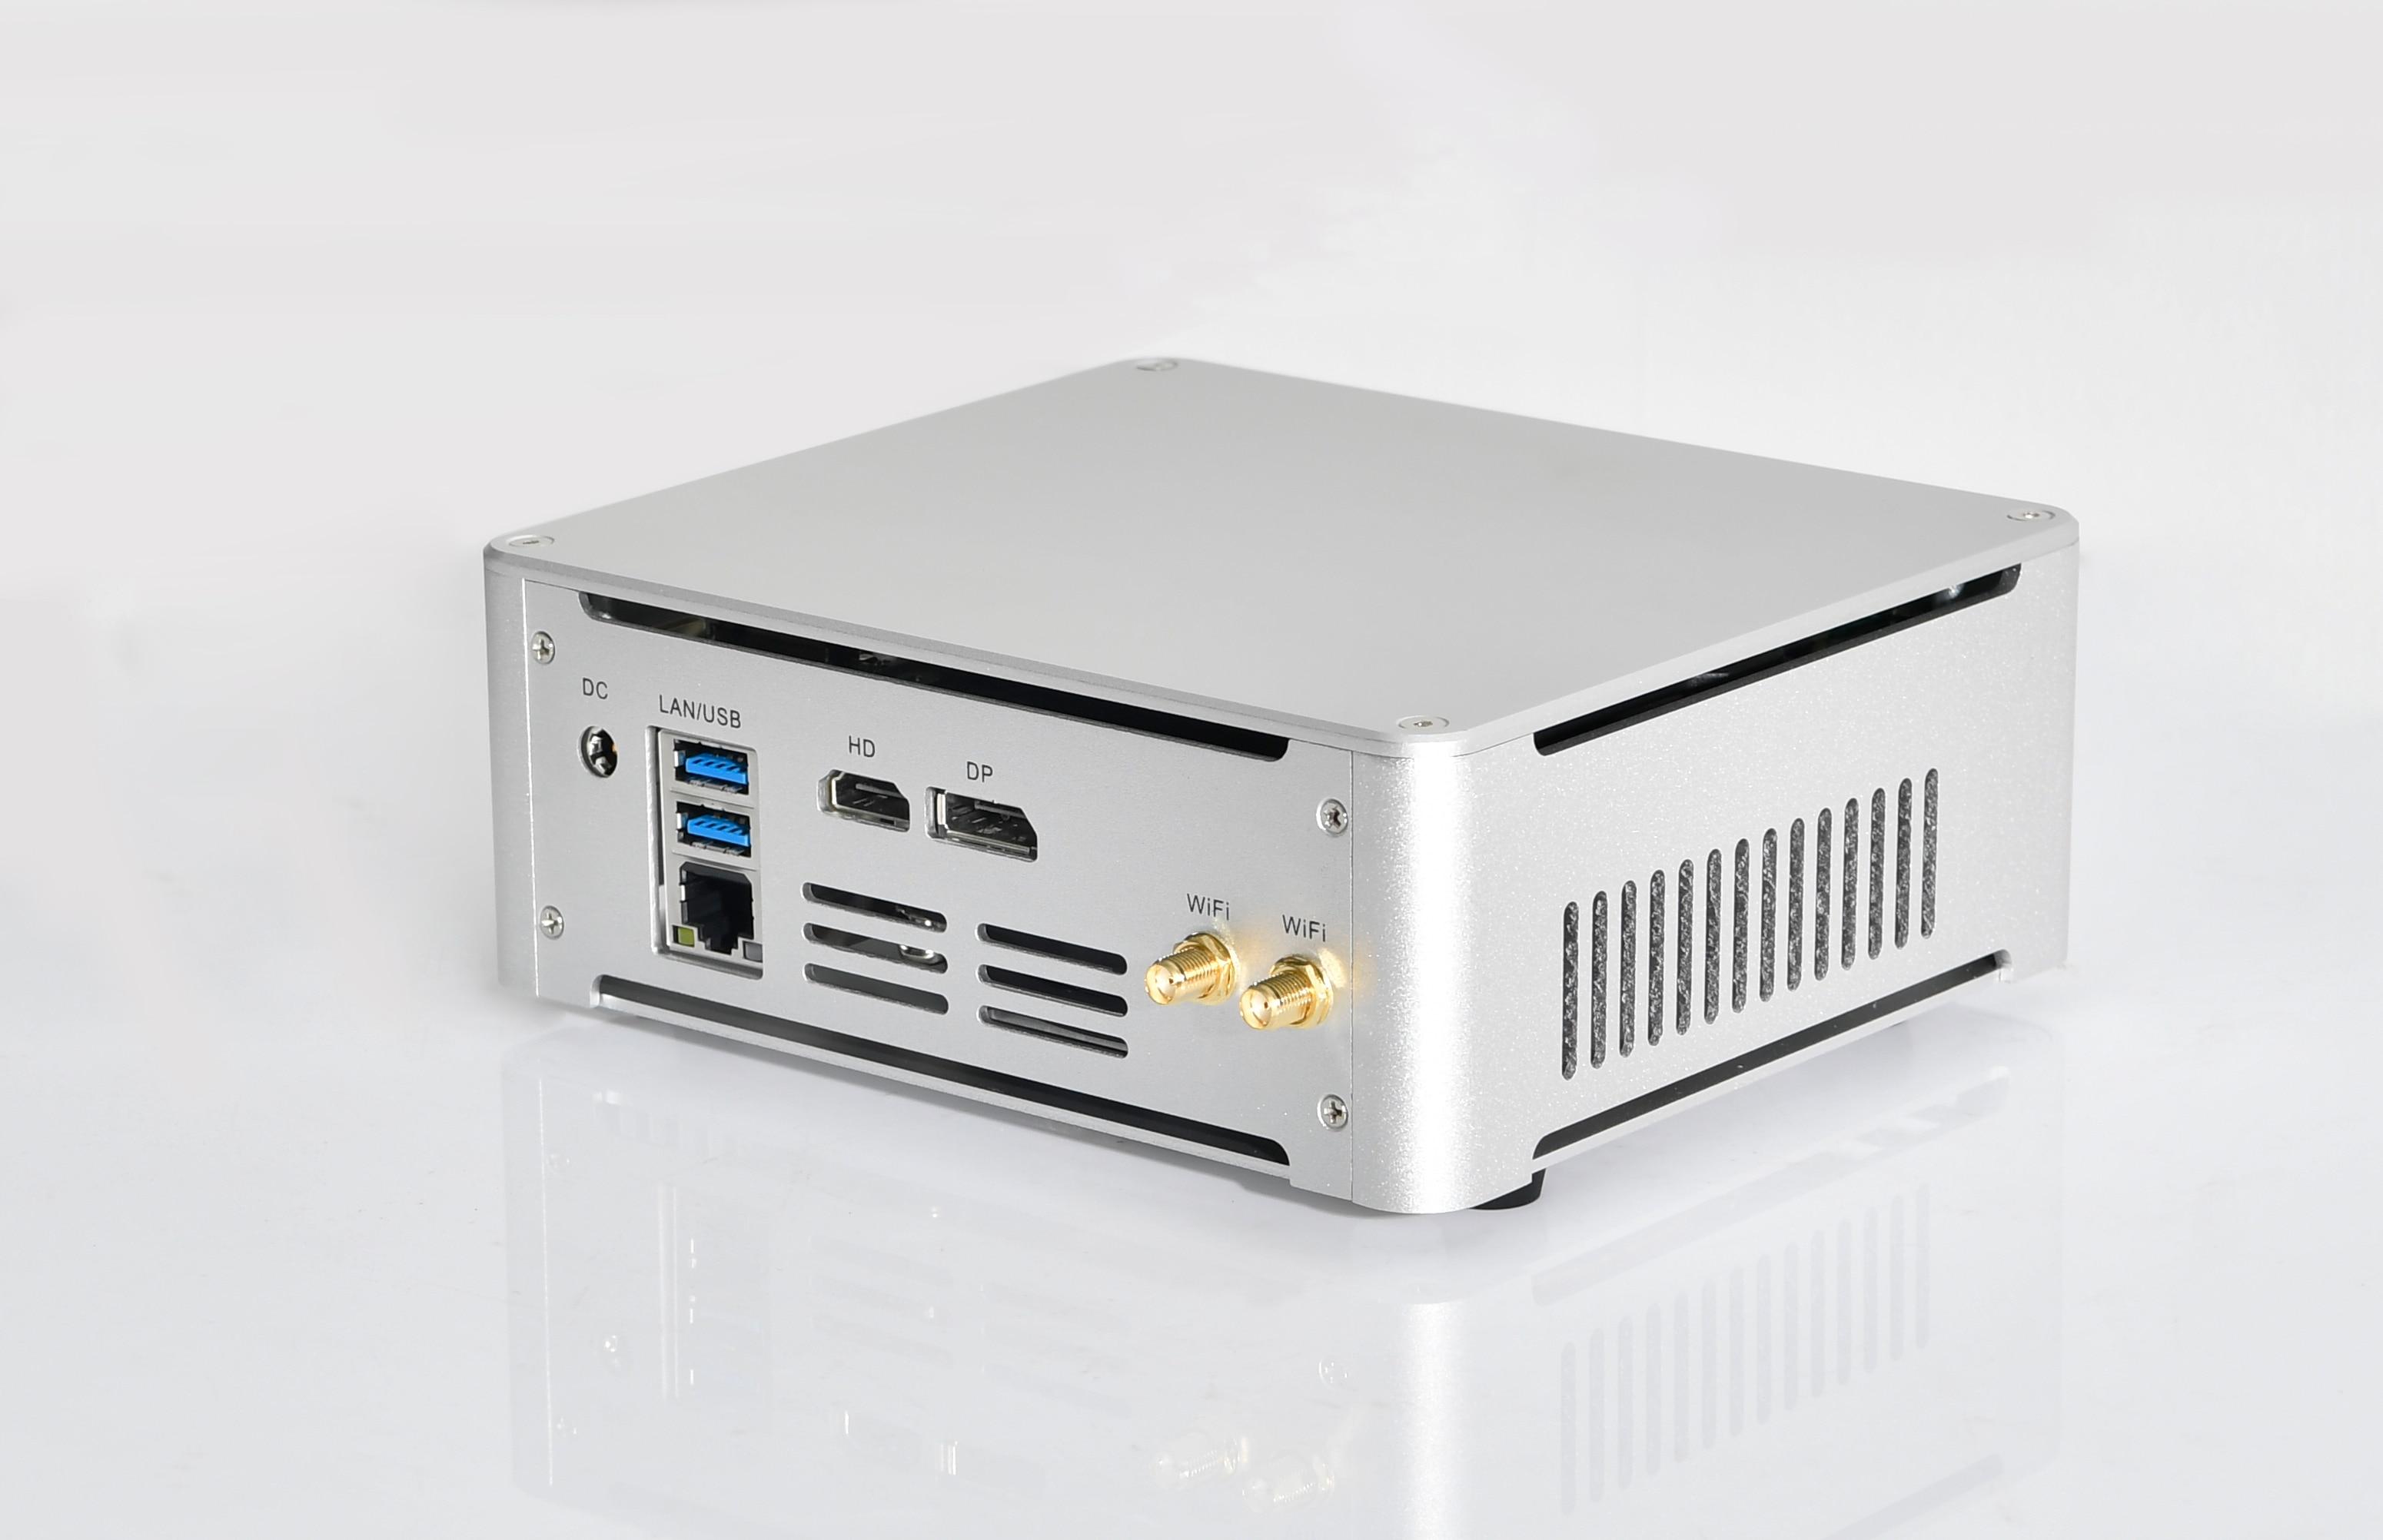 NC410 7th Gen FAN Mini PC Intel Quad Core I7 7820HK I5 7300HK DP HDMI LAN Windows 10 Pro Mini Desktop Computer